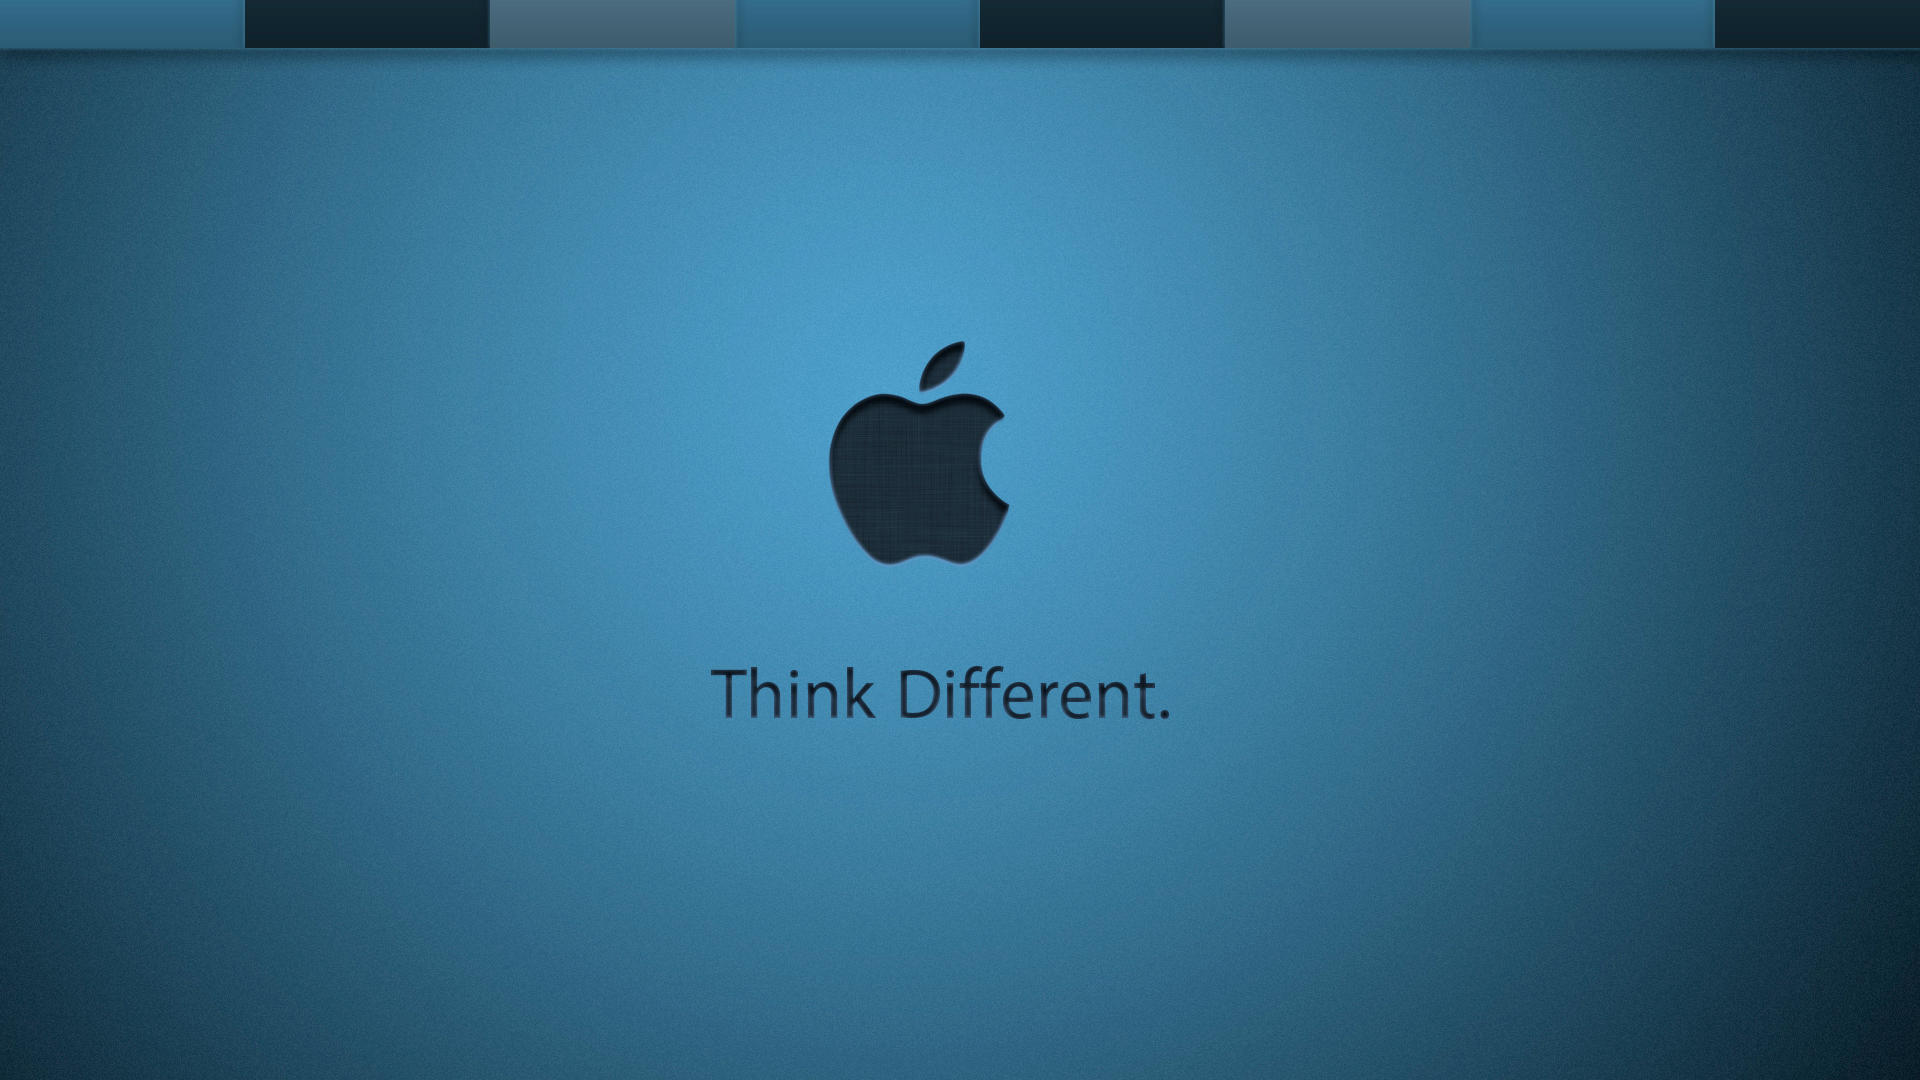 apple think differentkevino025 on deviantart